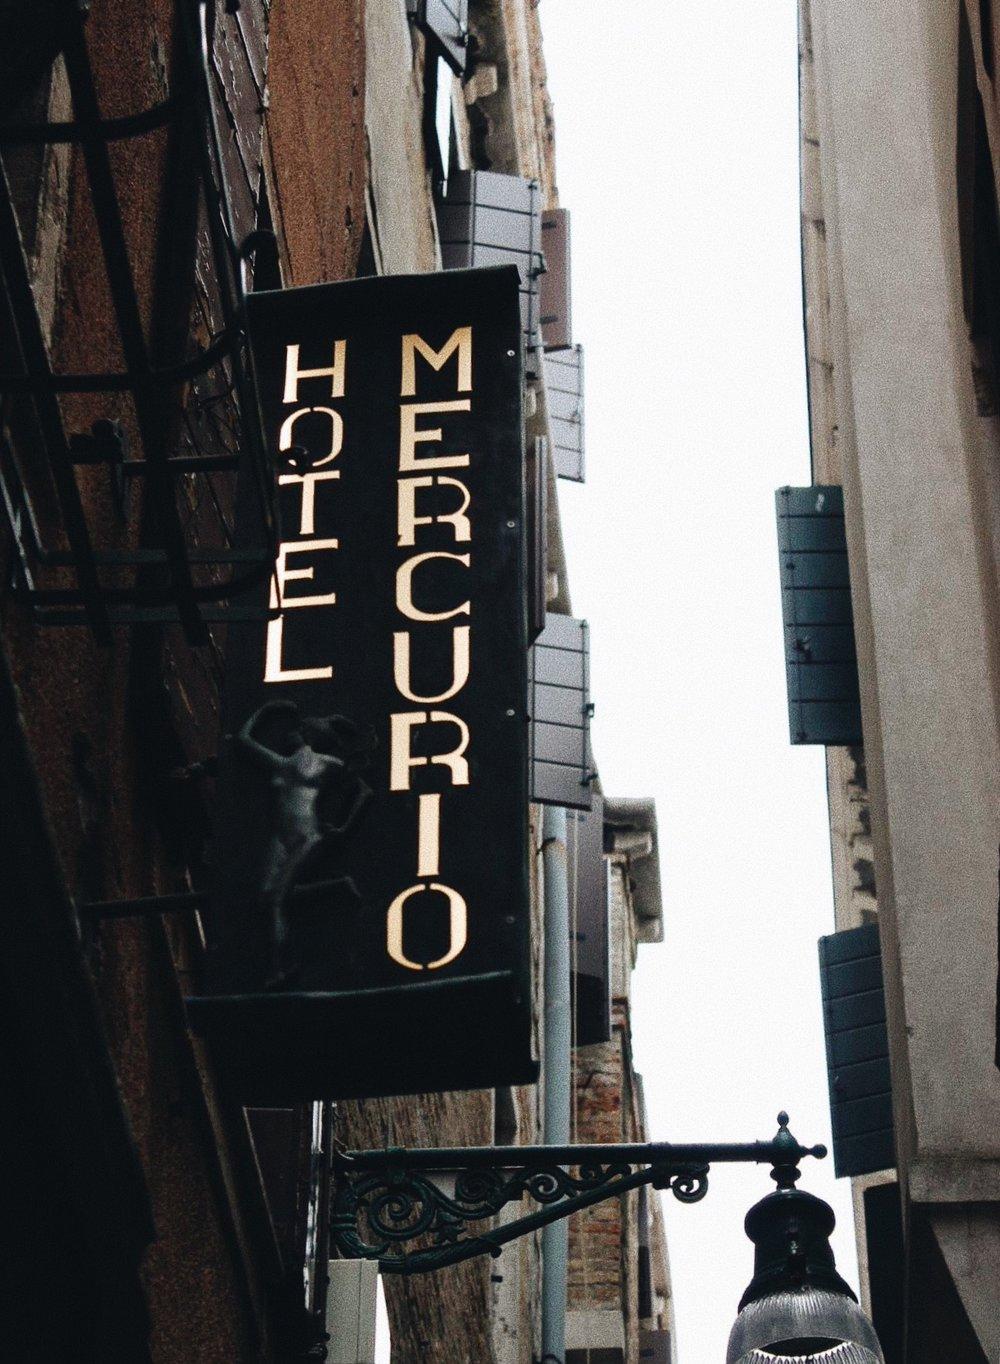 Venice Italy Hotel Mercurio